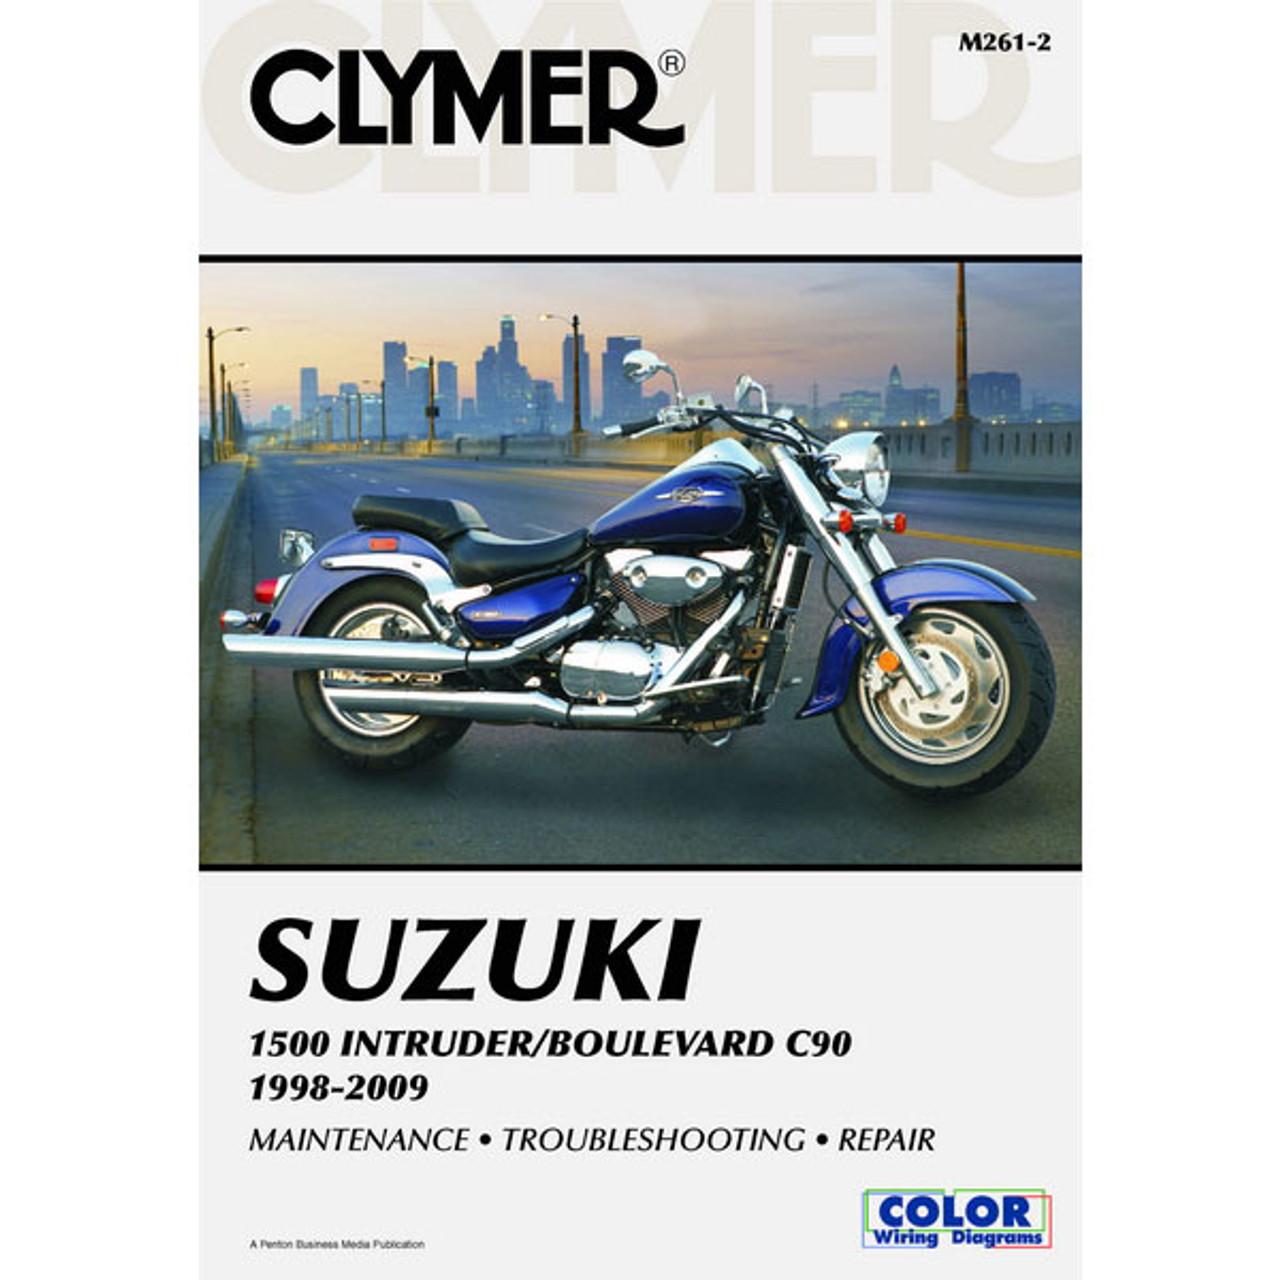 medium resolution of clymer suzuki 1500 intruder boulevard c90 98 09 service manual sportbike track gear